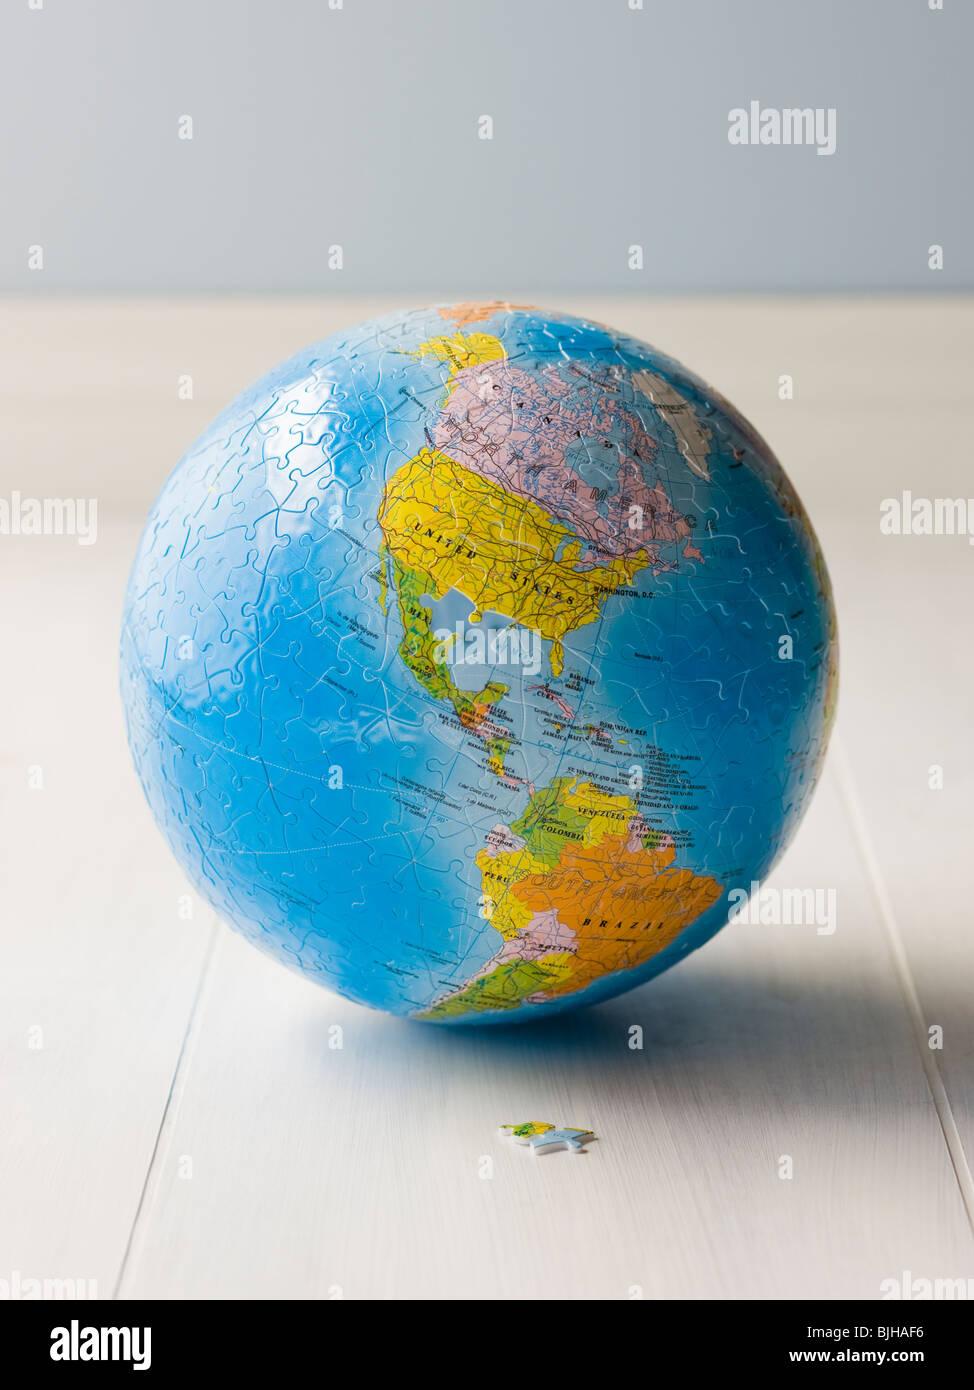 Planet Erde puzzle Stockbild